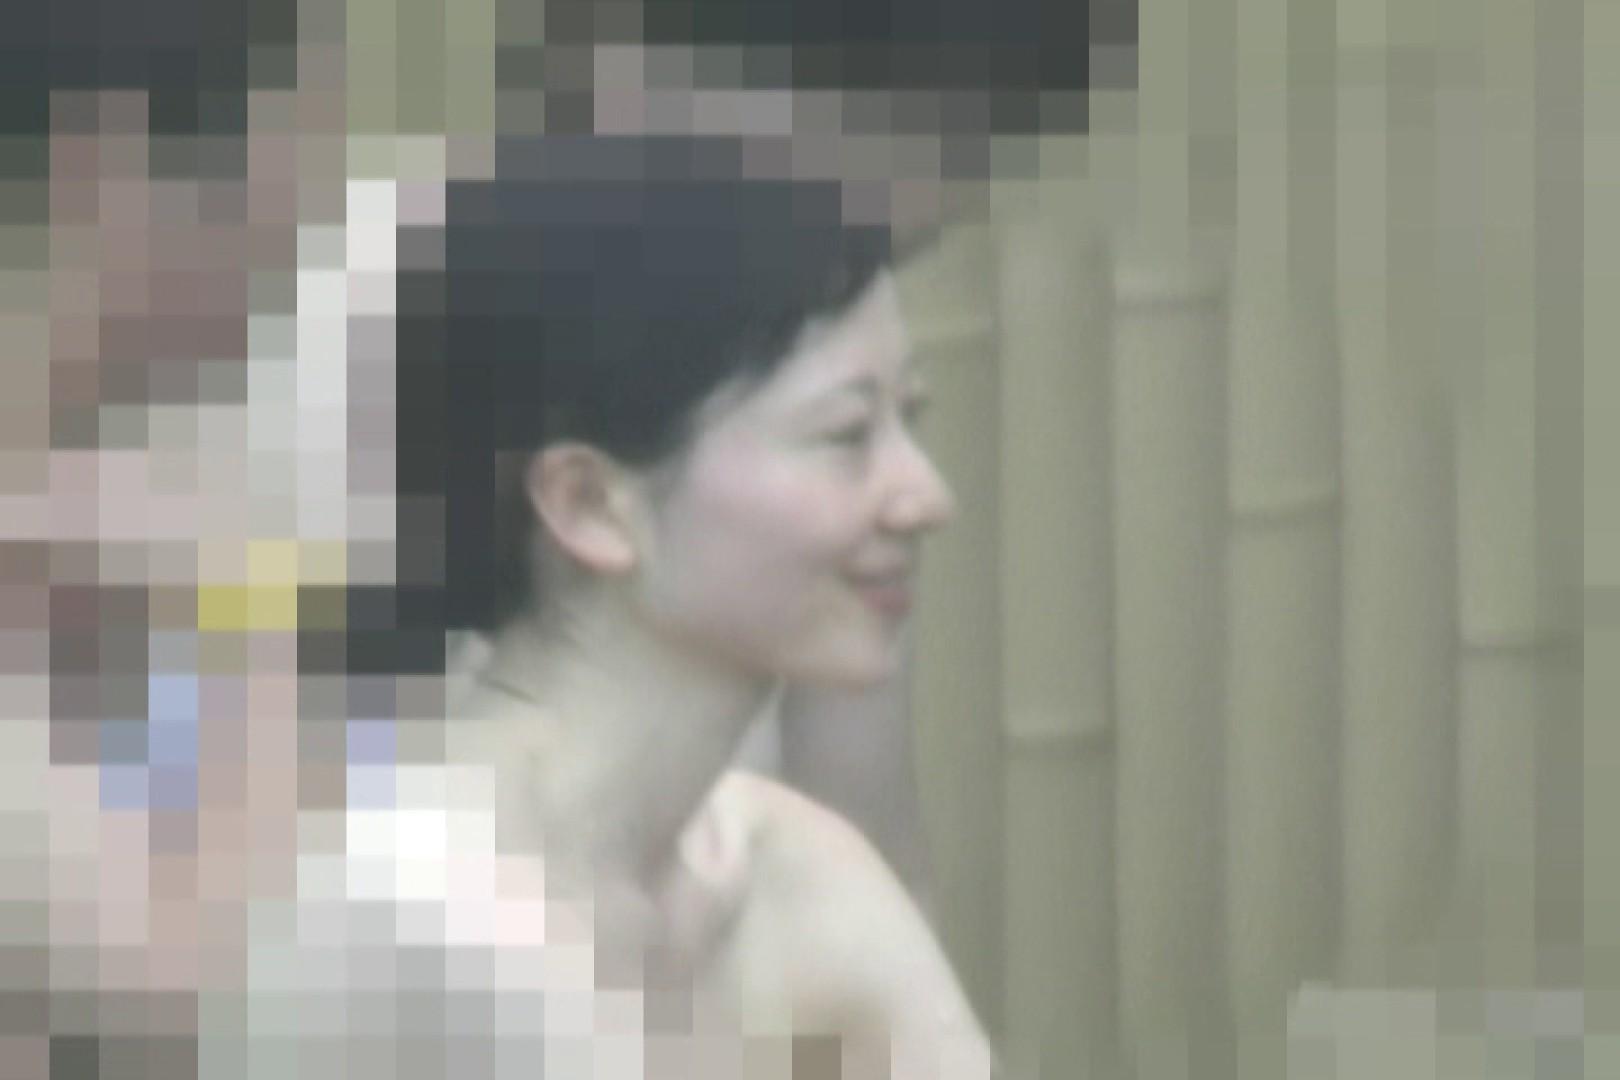 Aquaな露天風呂Vol.835 盗撮 | HなOL  73pic 48